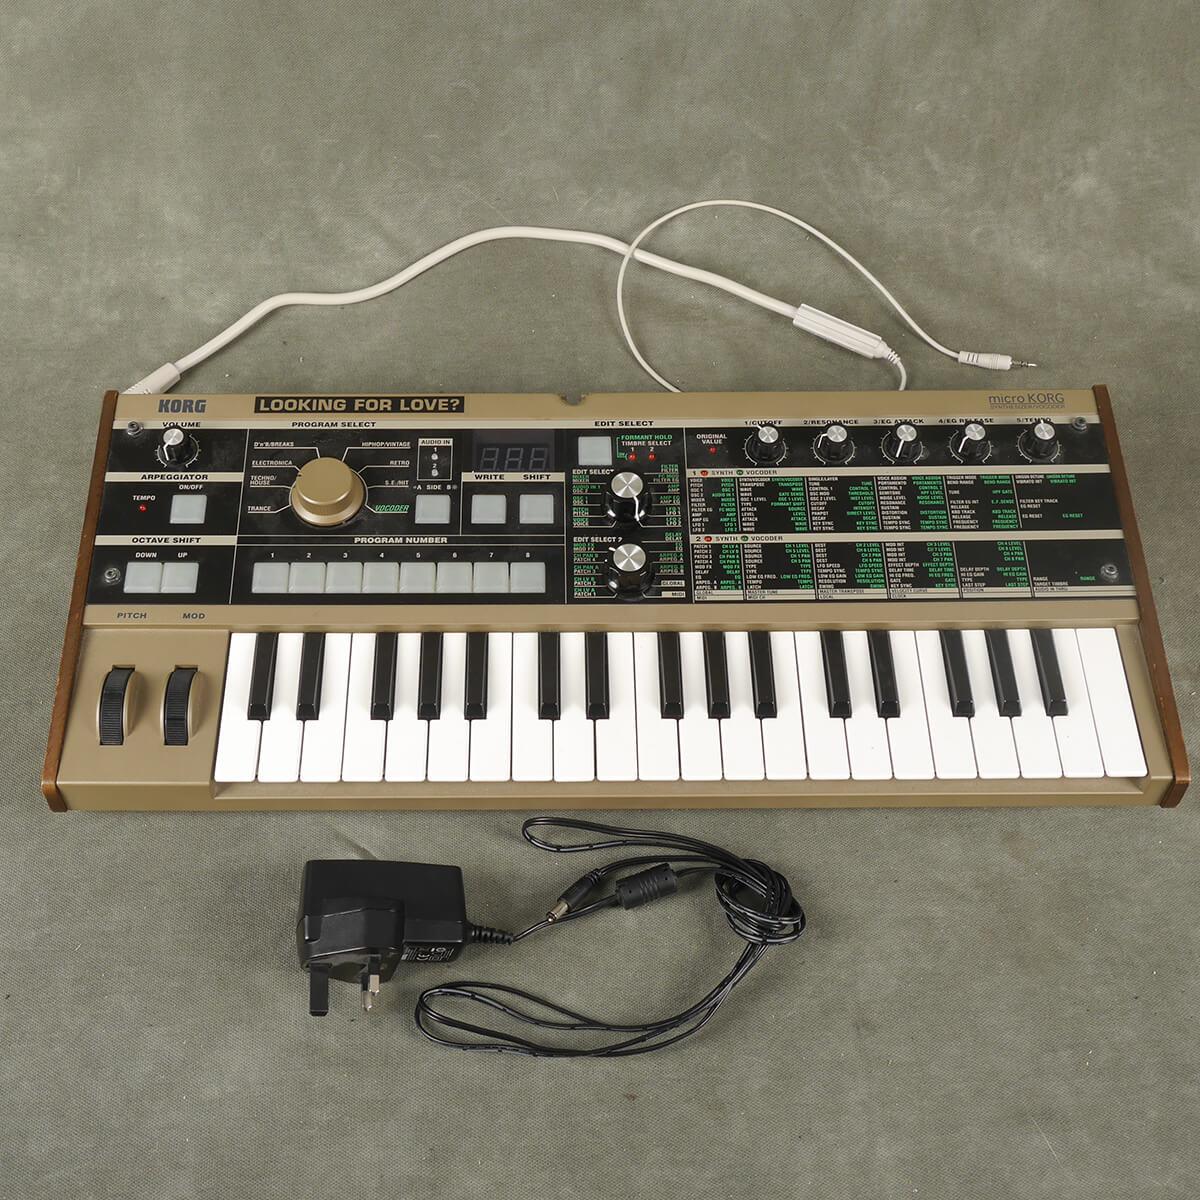 Korg Micro Korg Synthesizer w/PSU & Gooseneck Mic - 2nd Hand